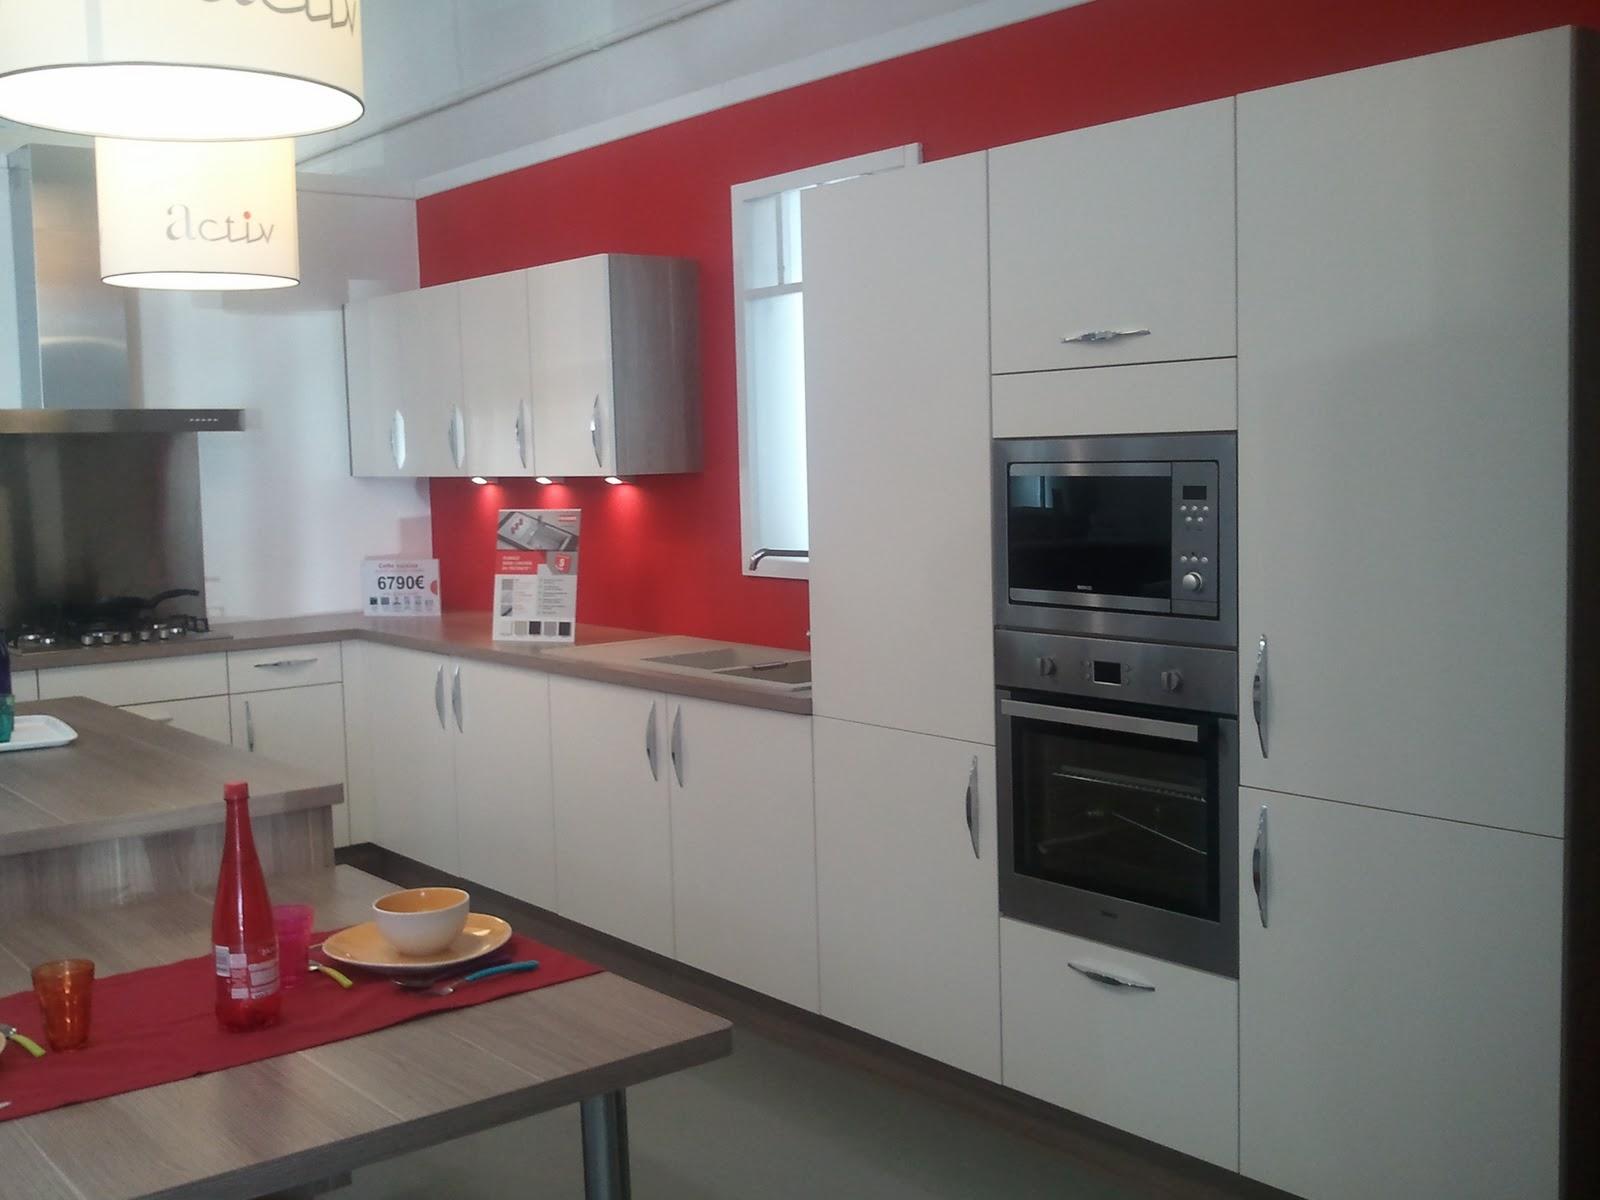 Cuisine Ikea Blanc Laque : Ma cuisine